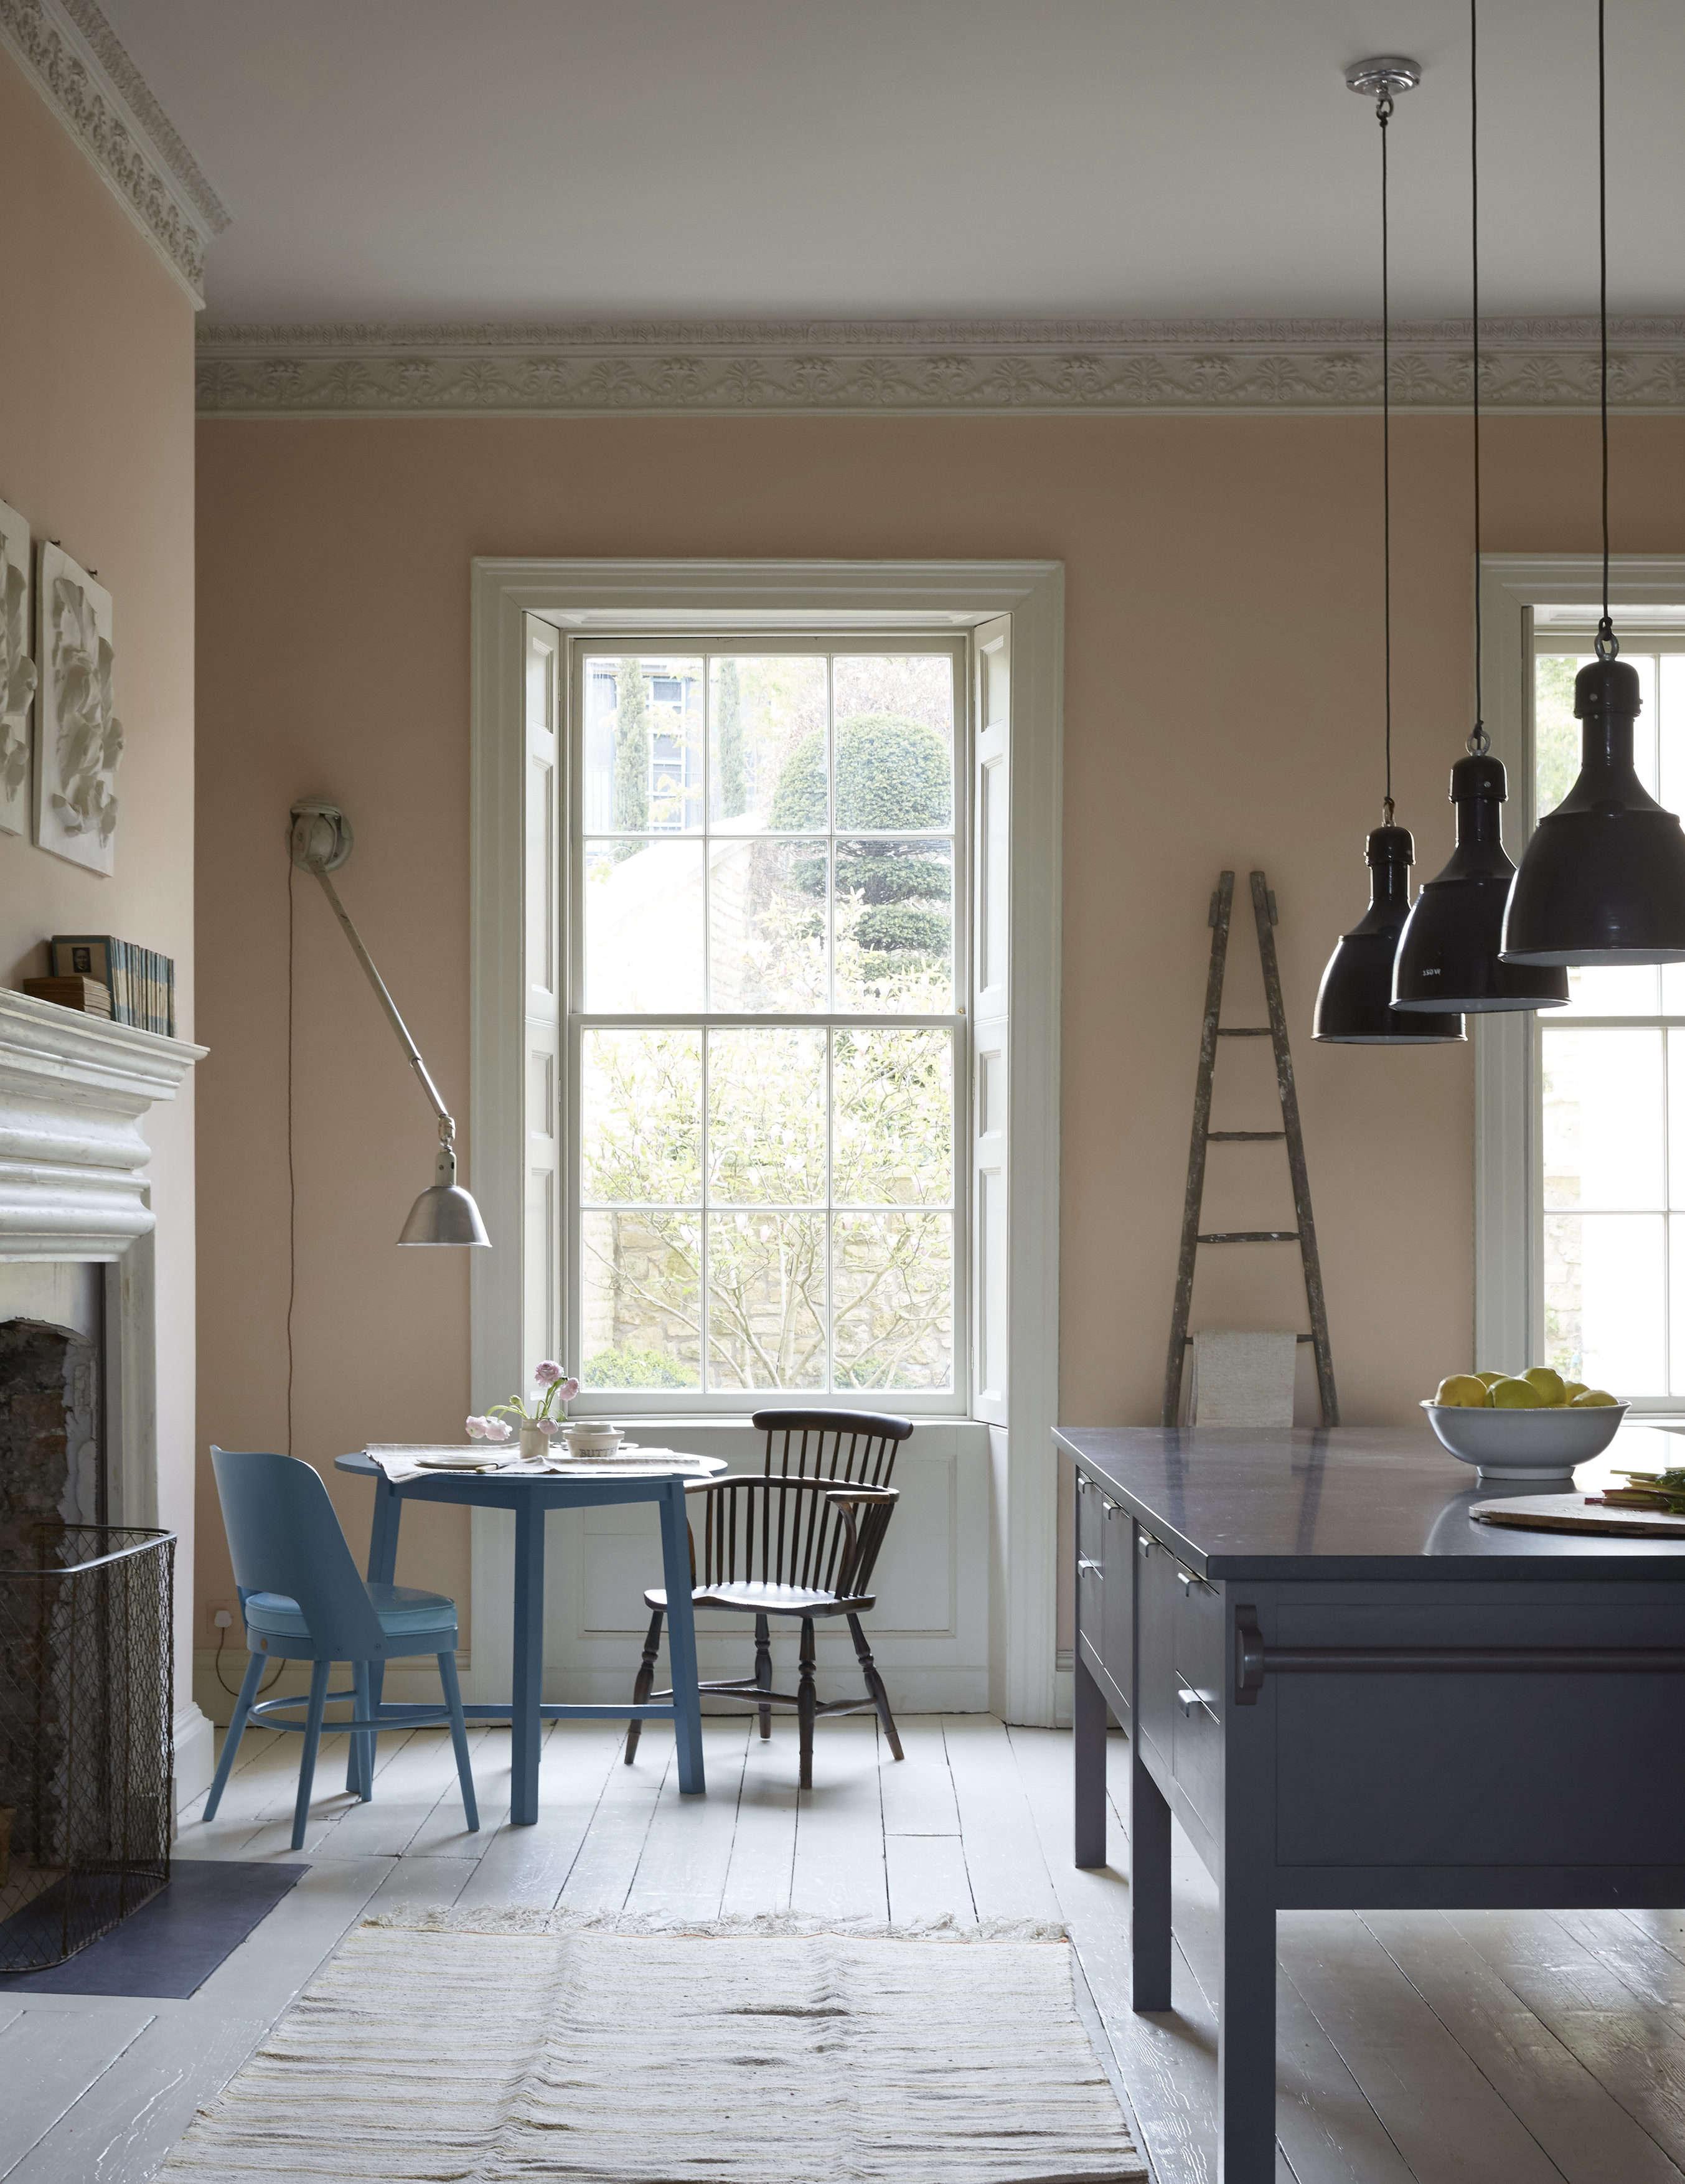 Nick Gilpin house Plain English kitchen, Bath, England, Nicola Harding interior design, Christopher Howe furnishings. Paul Massey photo.